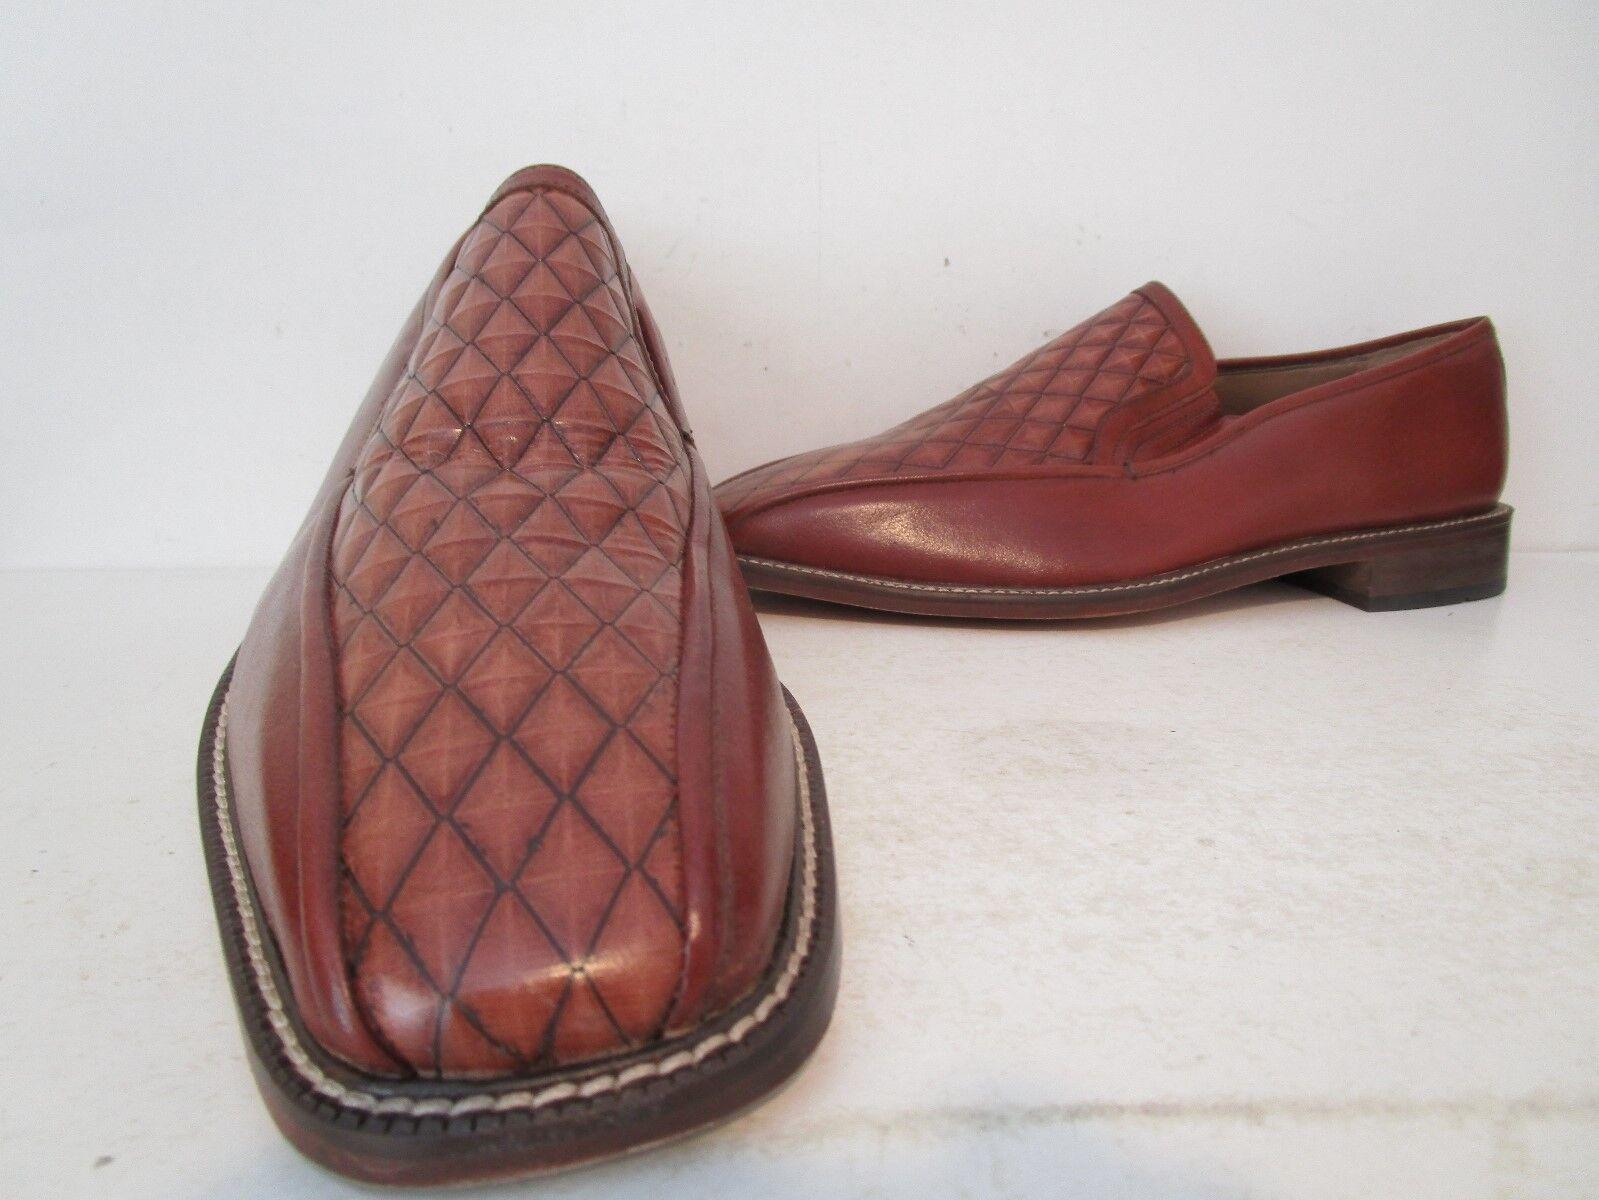 Stacy Adams Uomo Garda Pelle Casual Slip On Loafers Dress Shoe Cognac 13 12 M